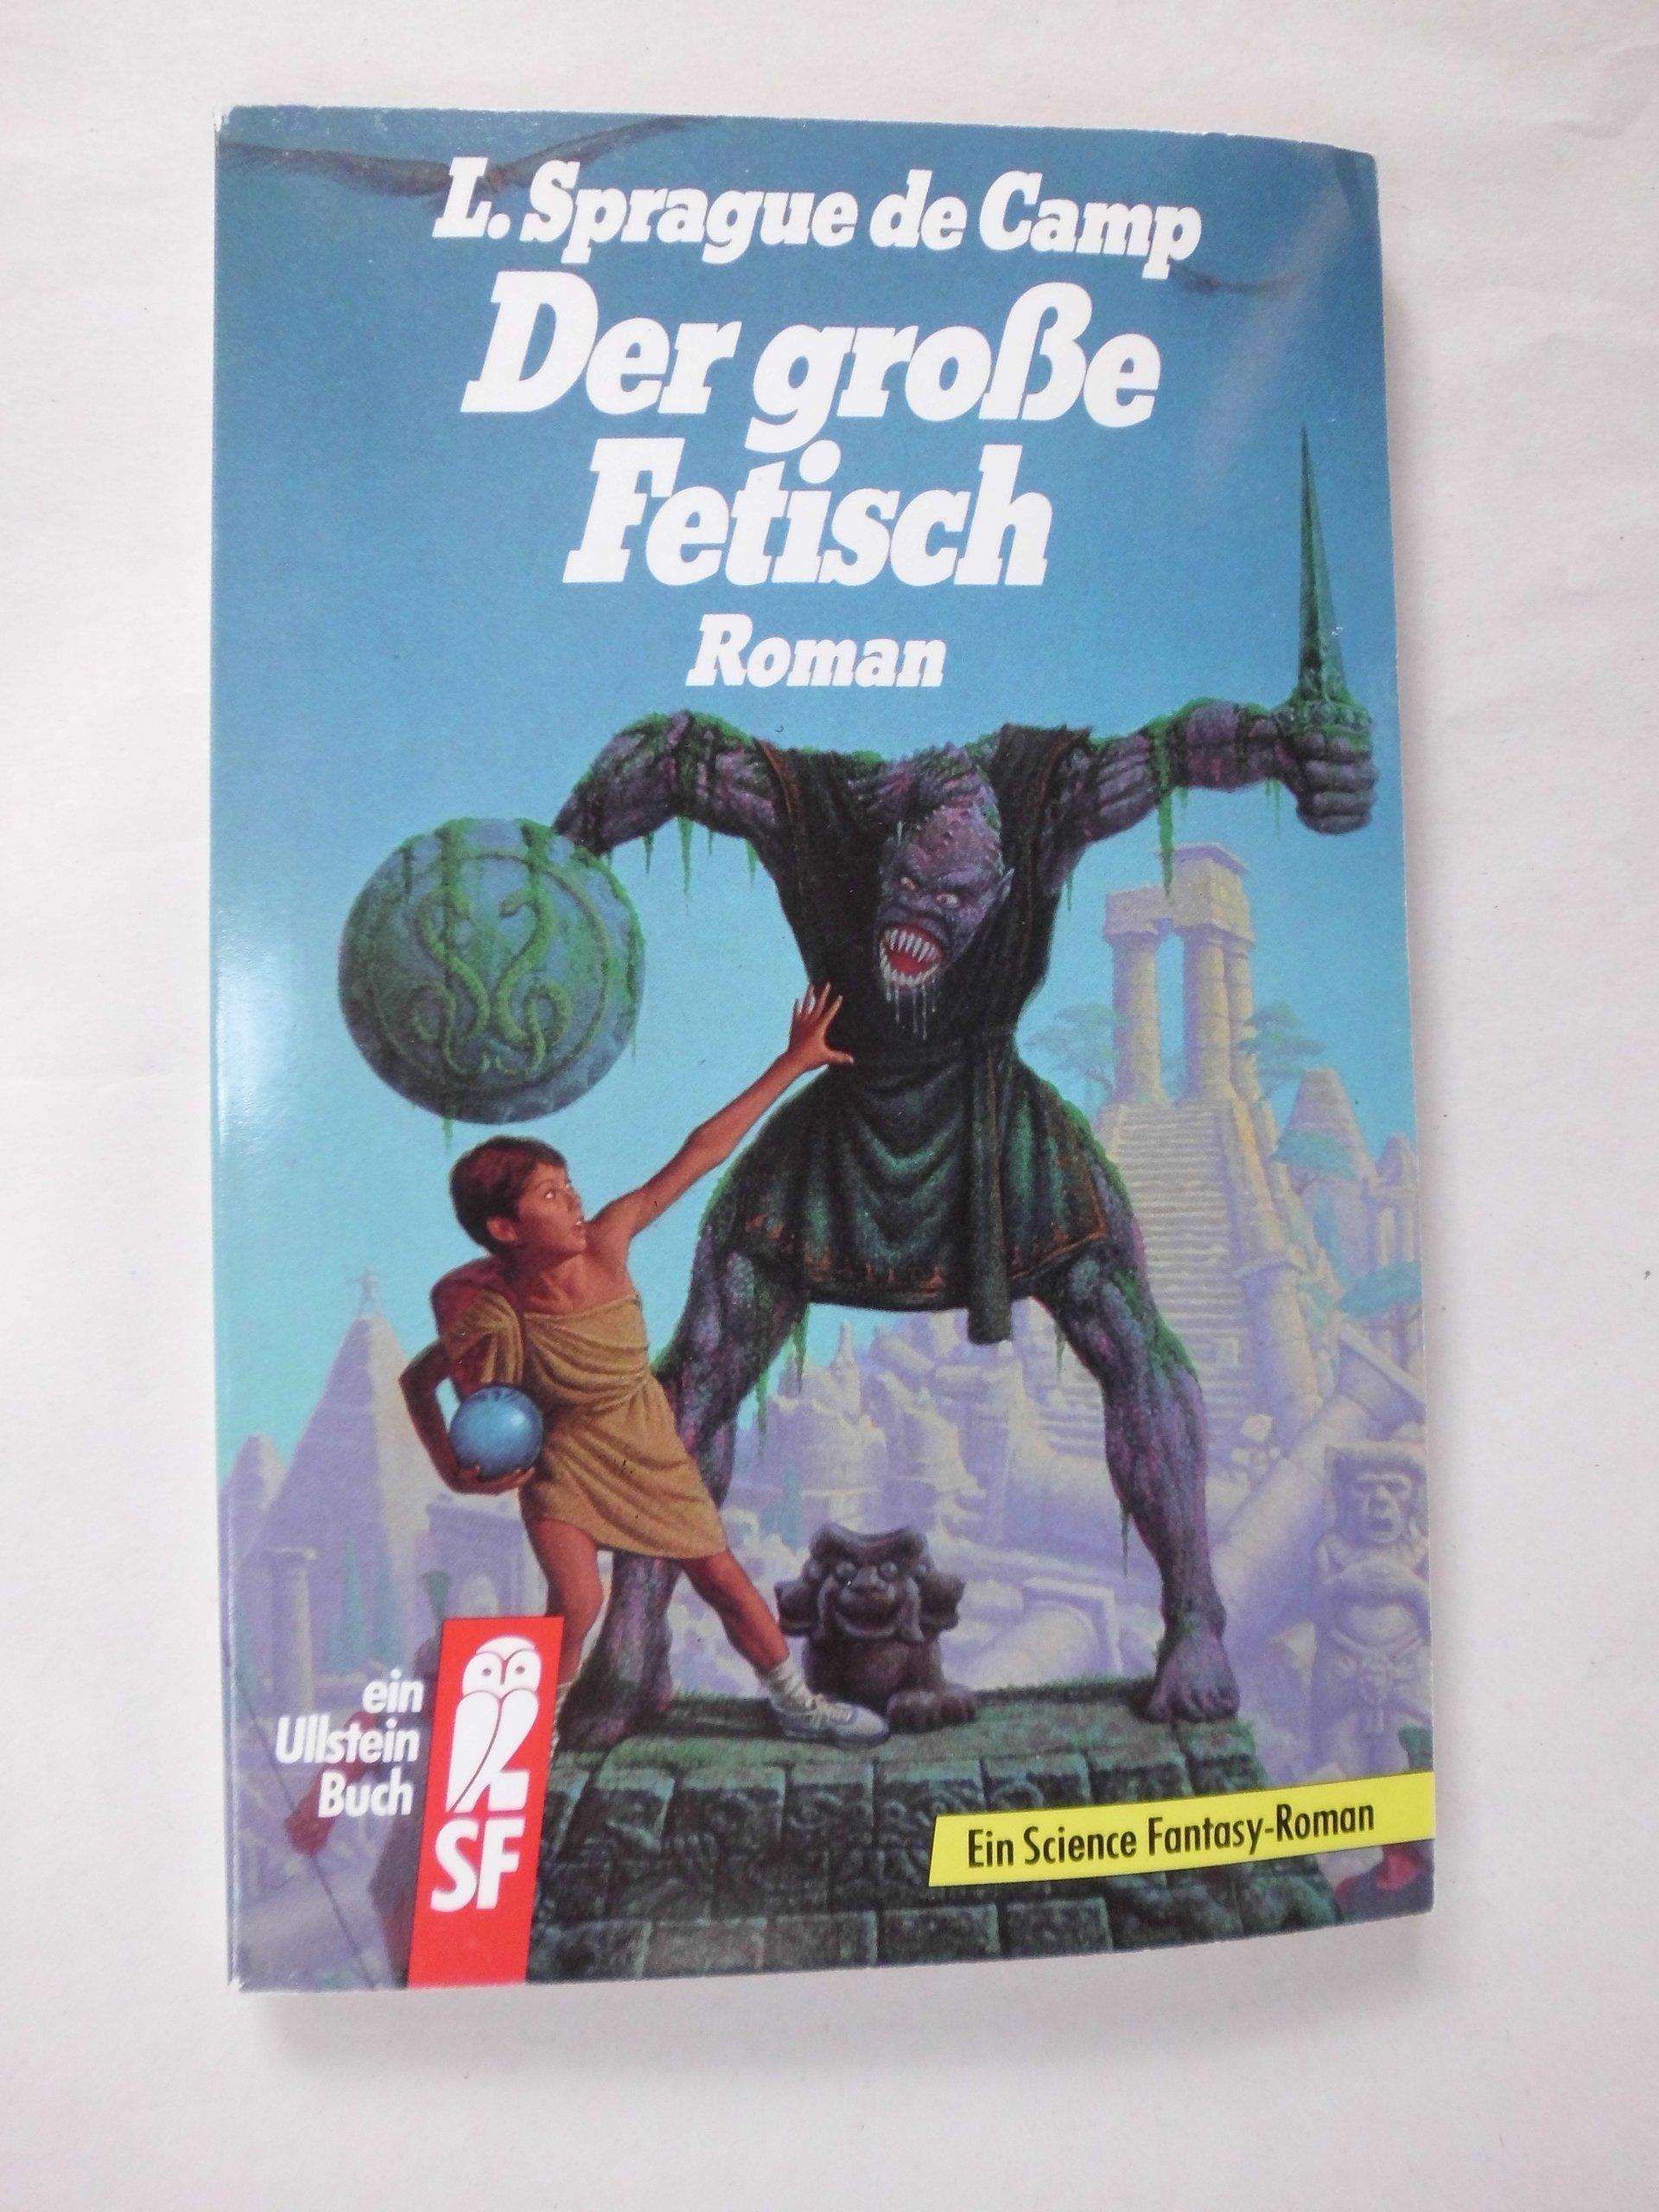 Der große Fetisch. Roman. (Science Fiction).